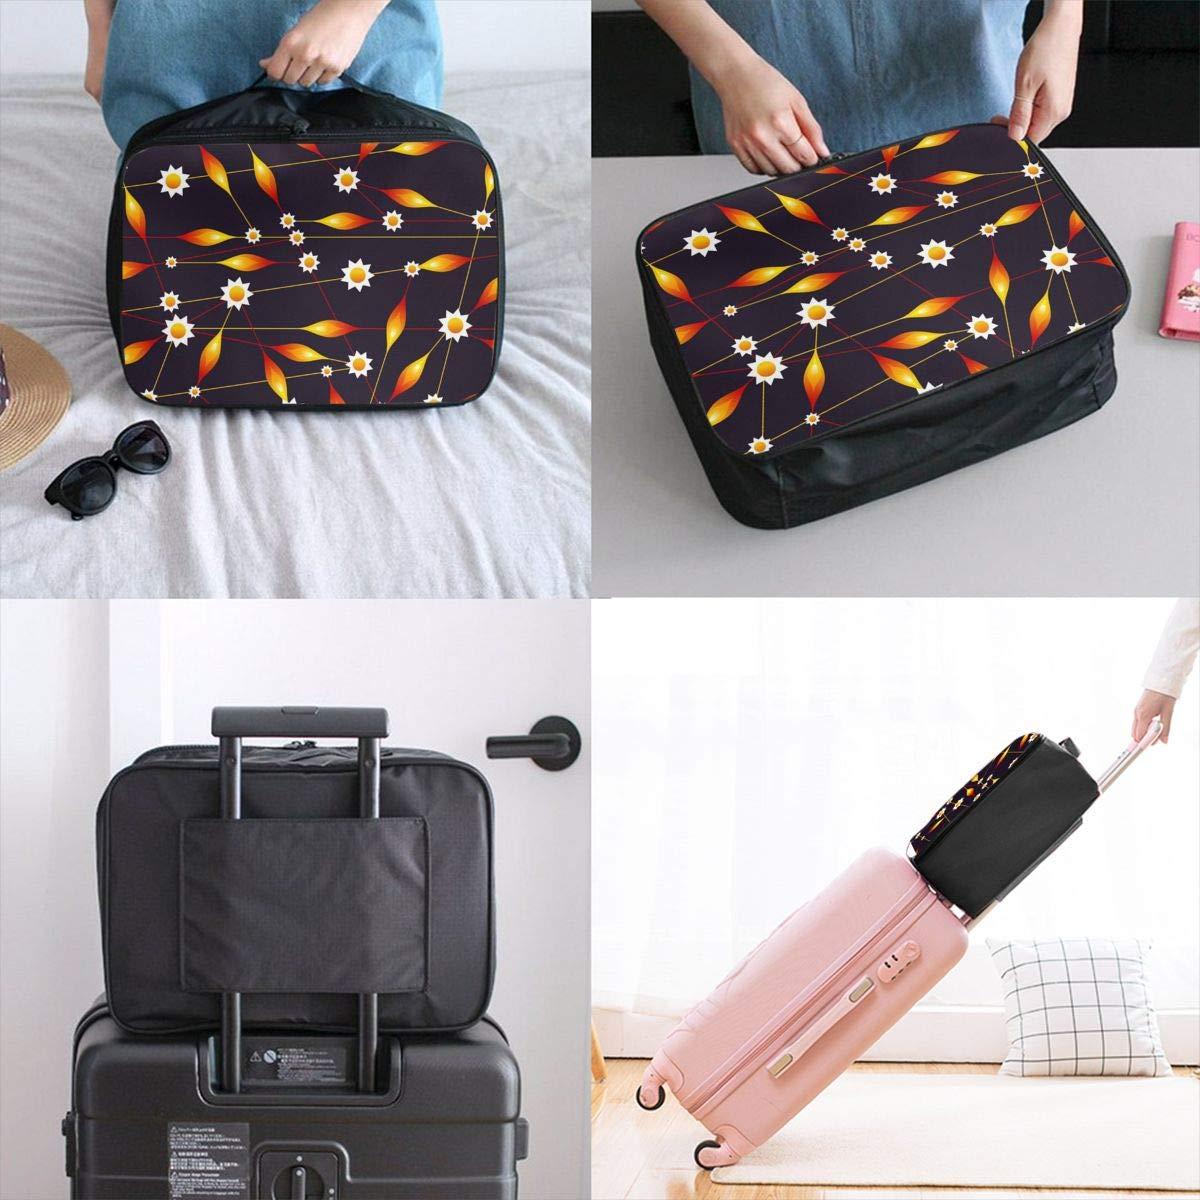 Flower Bud Pattern Orange Travel Lightweight Waterproof Foldable Storage Carry Luggage Large Capacity Portable Luggage Bag Duffel Bag